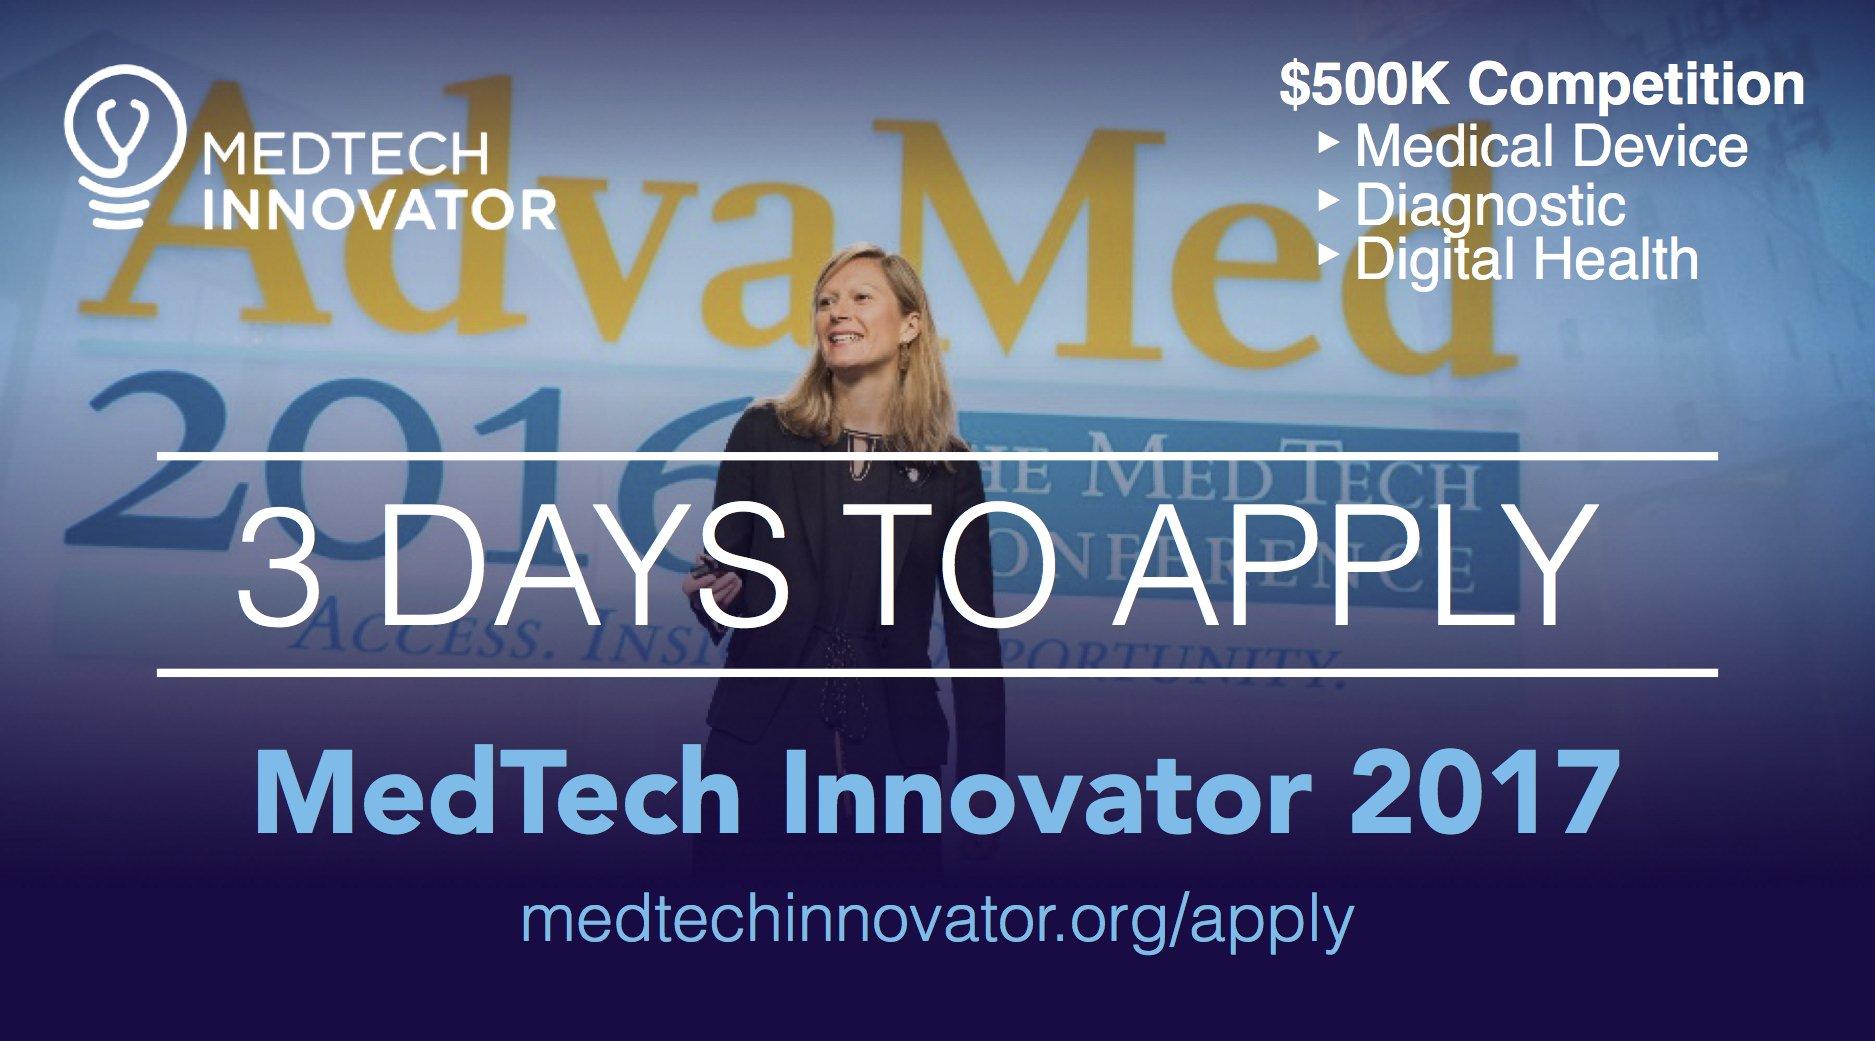 MedTech Innovator Competition.jpg-large.jpeg